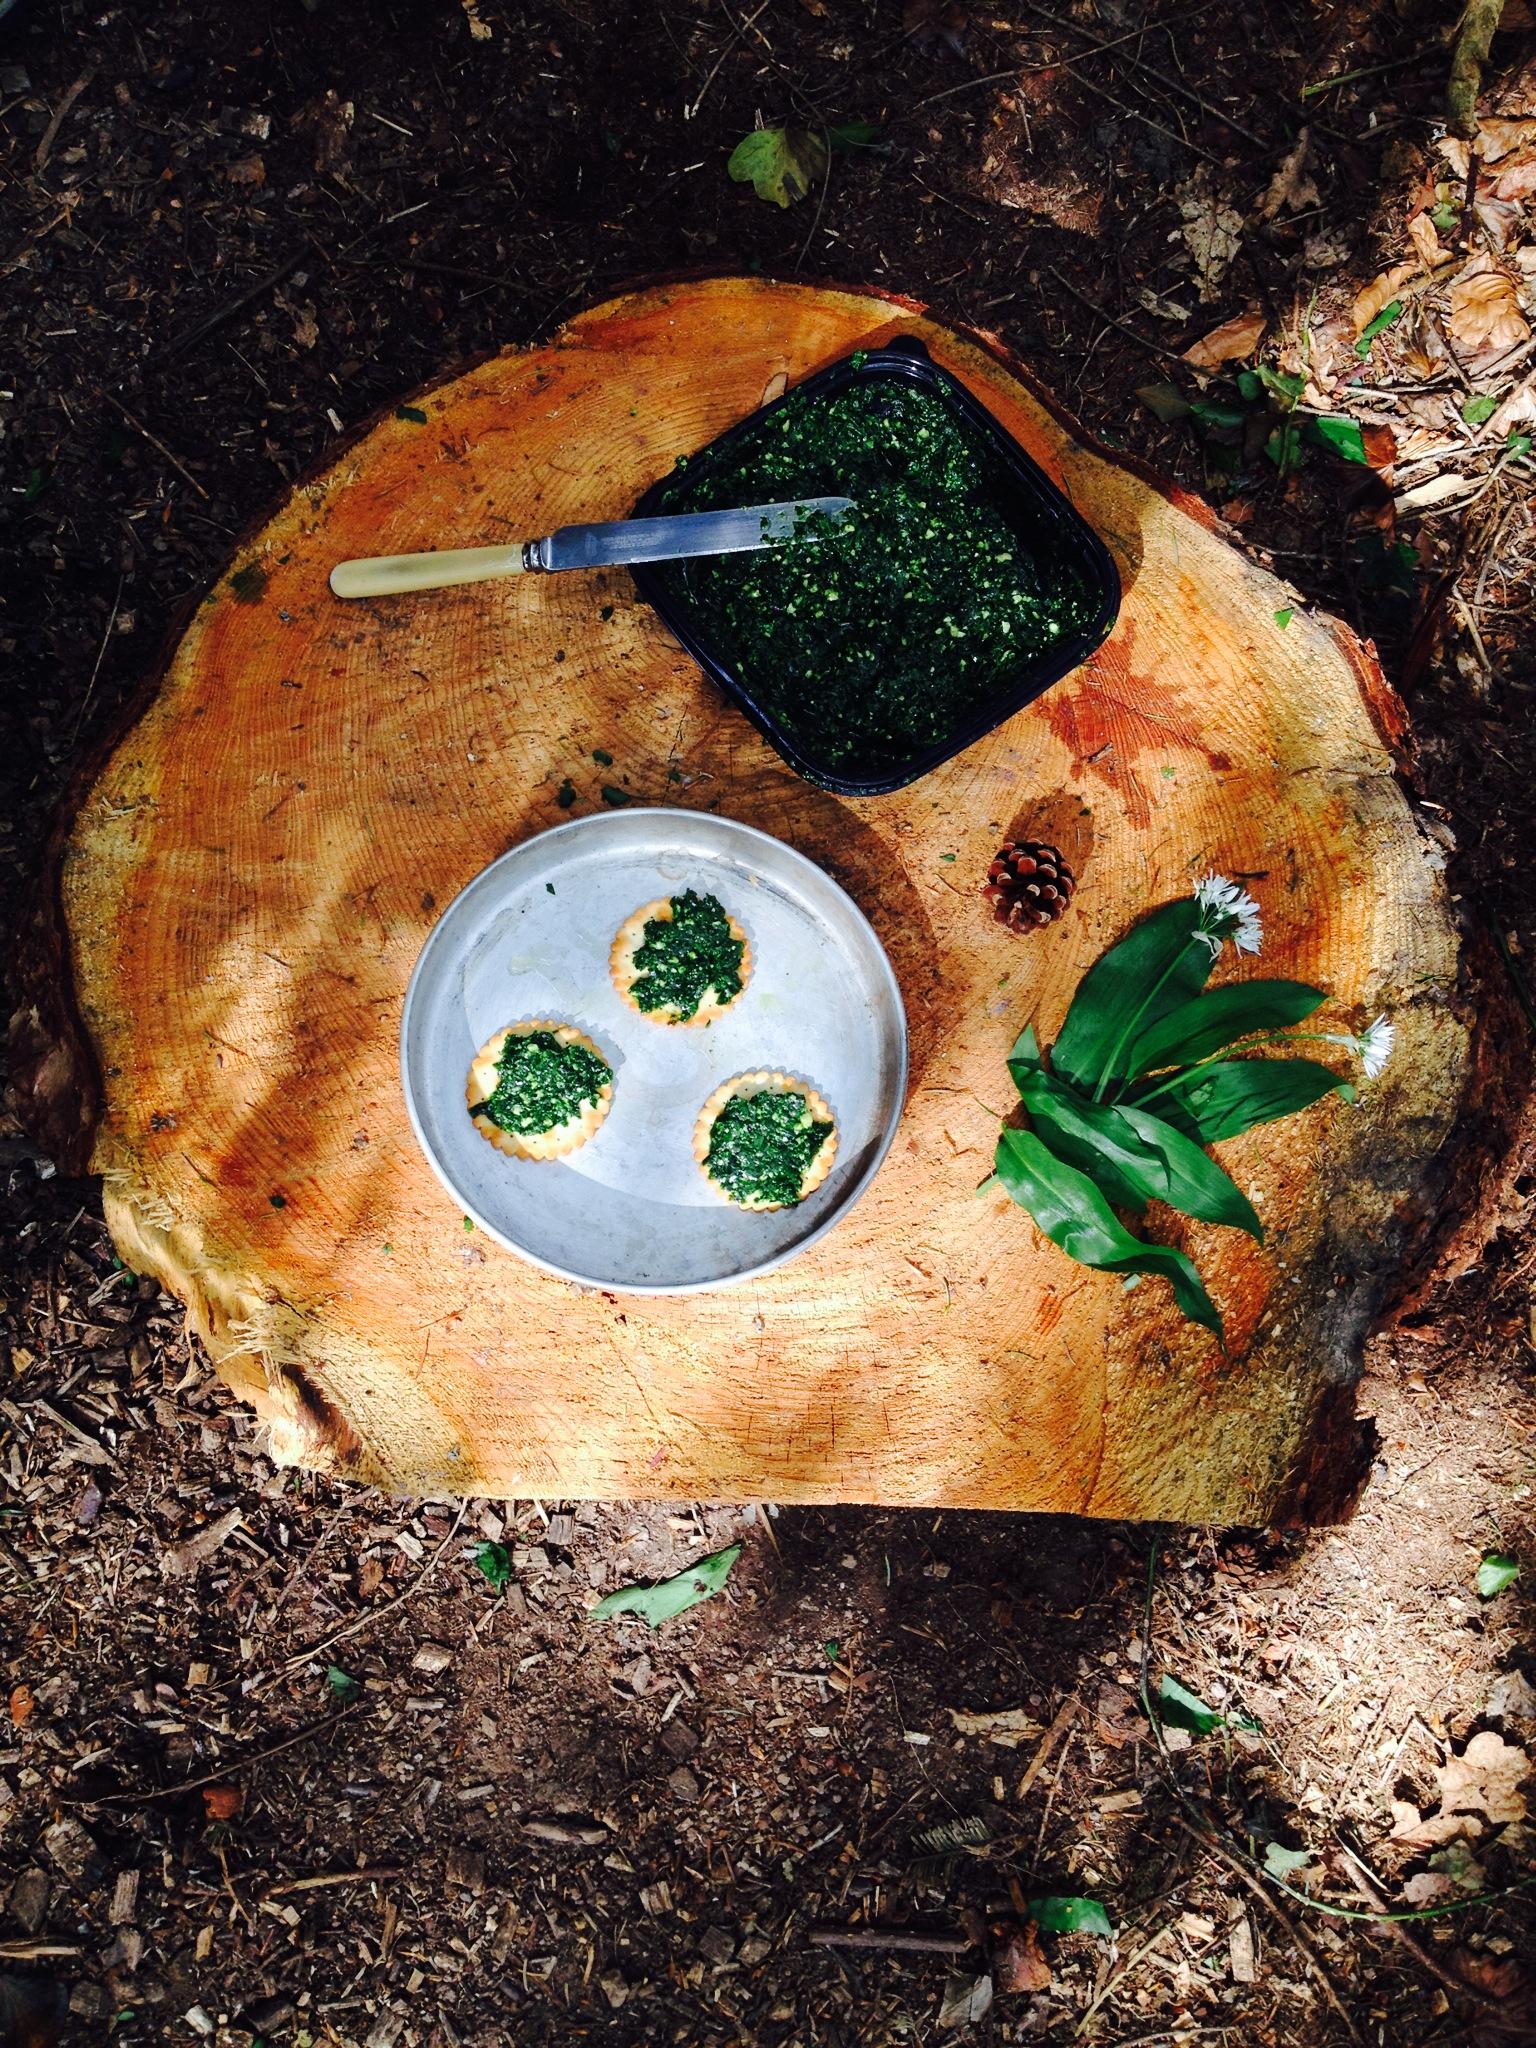 Wild garlic pesto made at The Forest Club